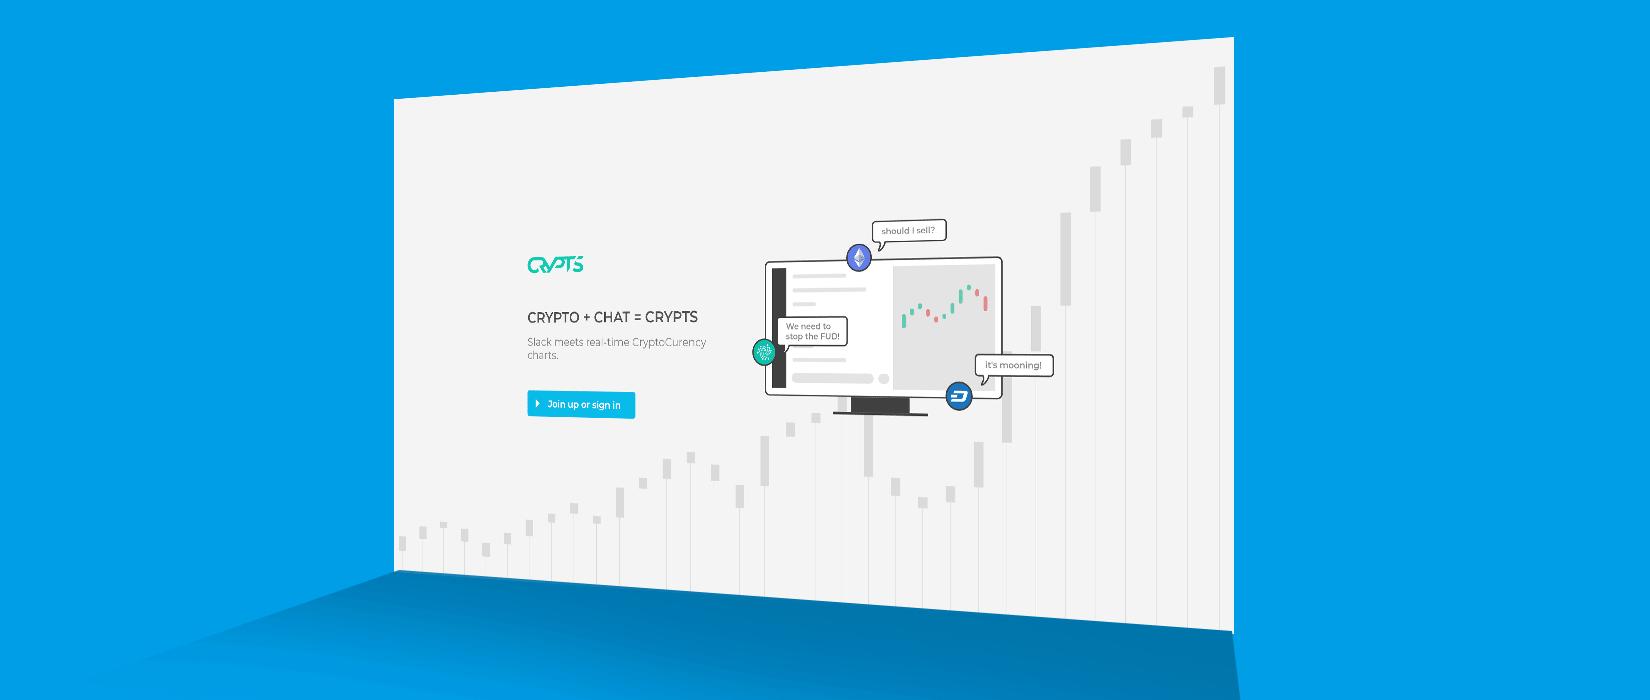 landing page design in 2018 tutorial